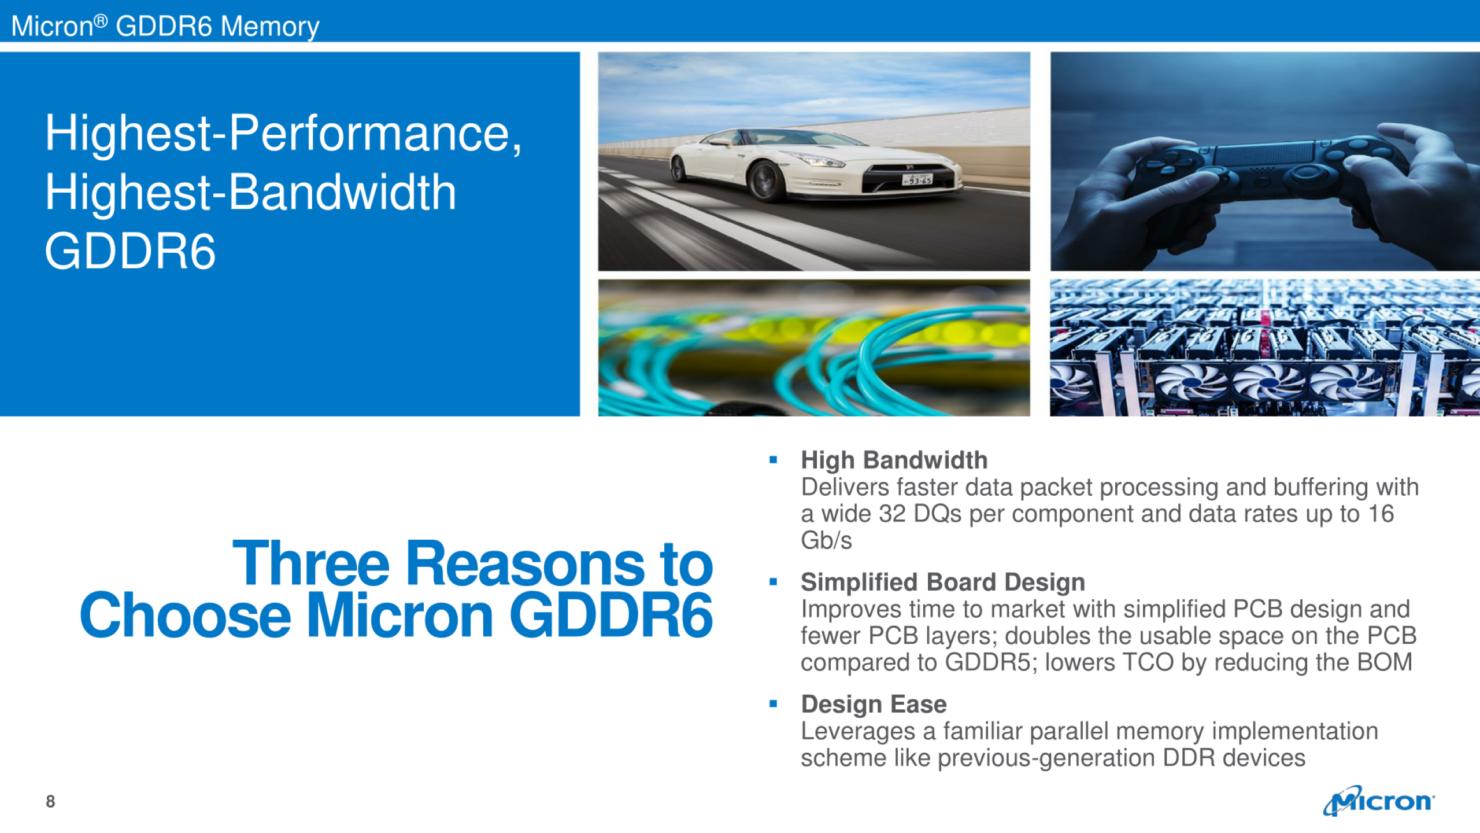 micron-gddr6-memory_6-custom